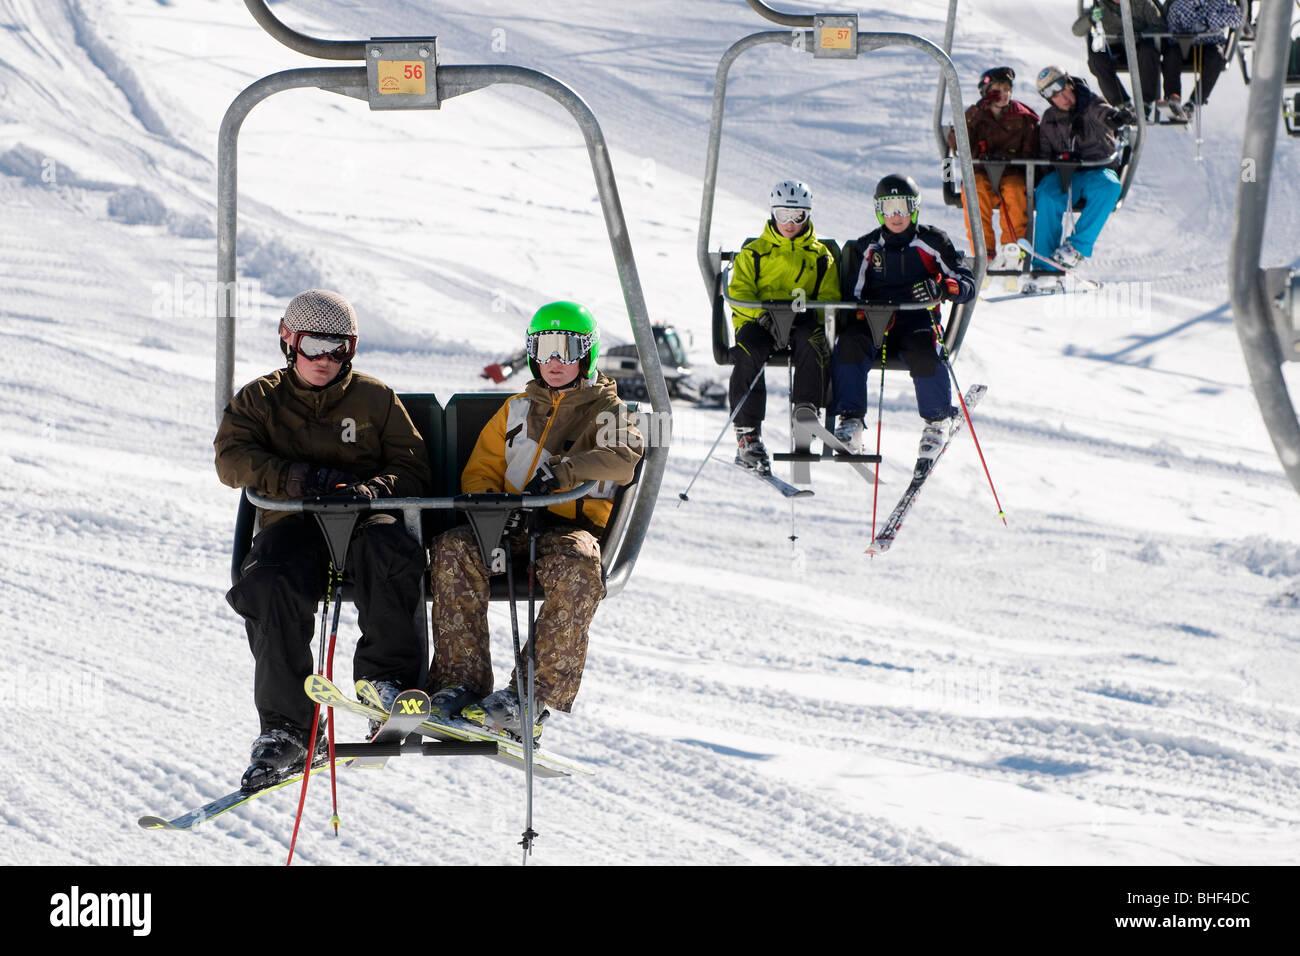 junge Skifahrer am Skilift Stuhl, Kitzbühel, Österreich Stockfoto